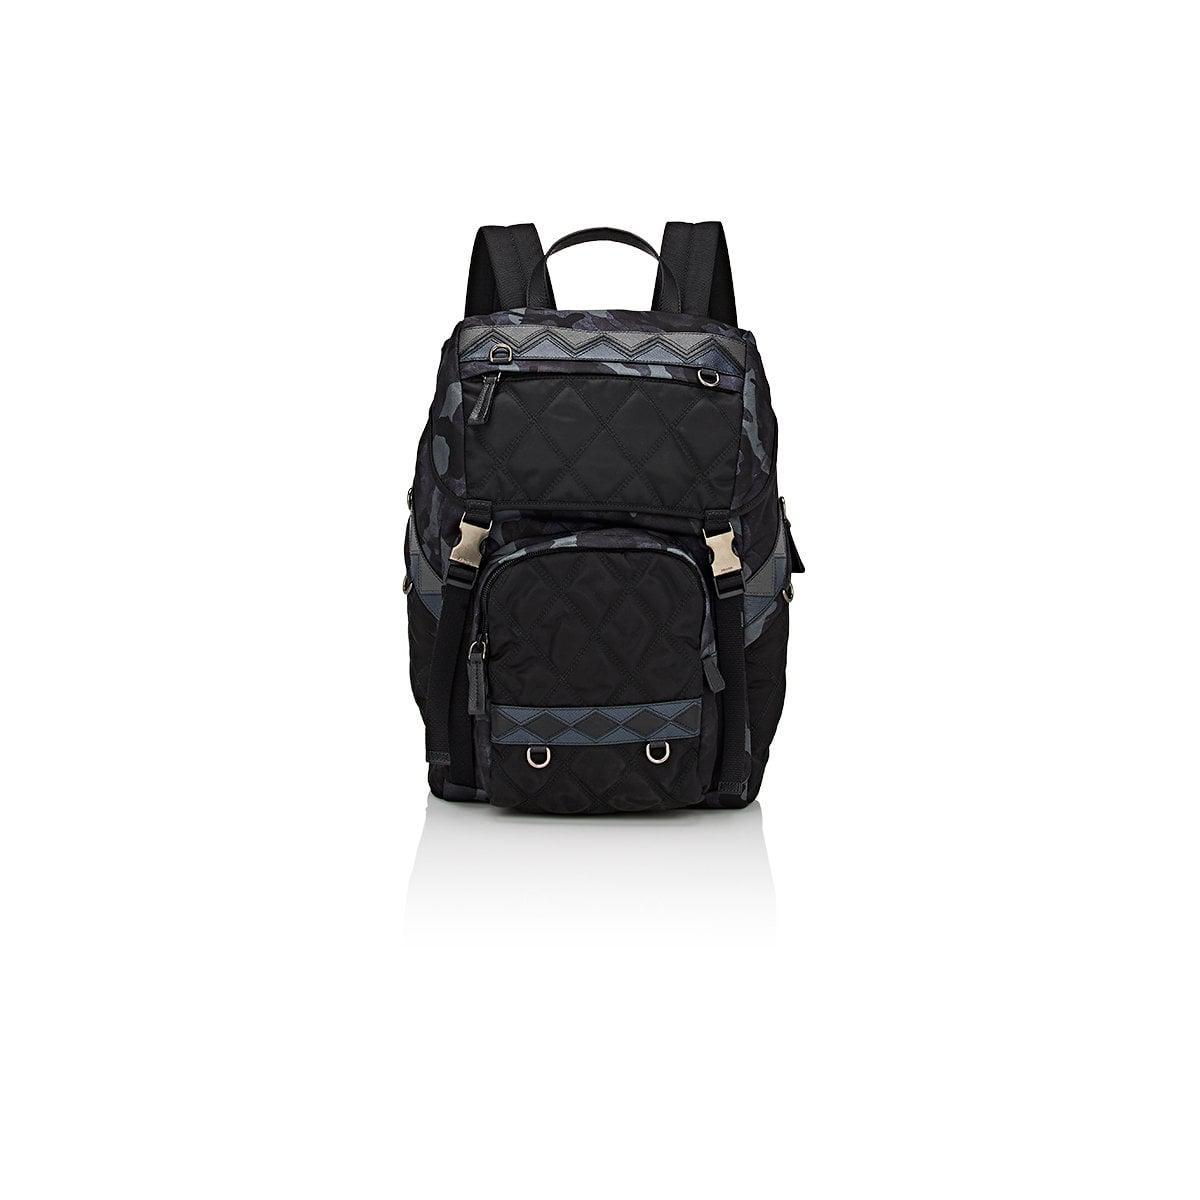 2b3f3b4f7b6b Prada Zaino Quilted Backpack in Blue for Men - Lyst